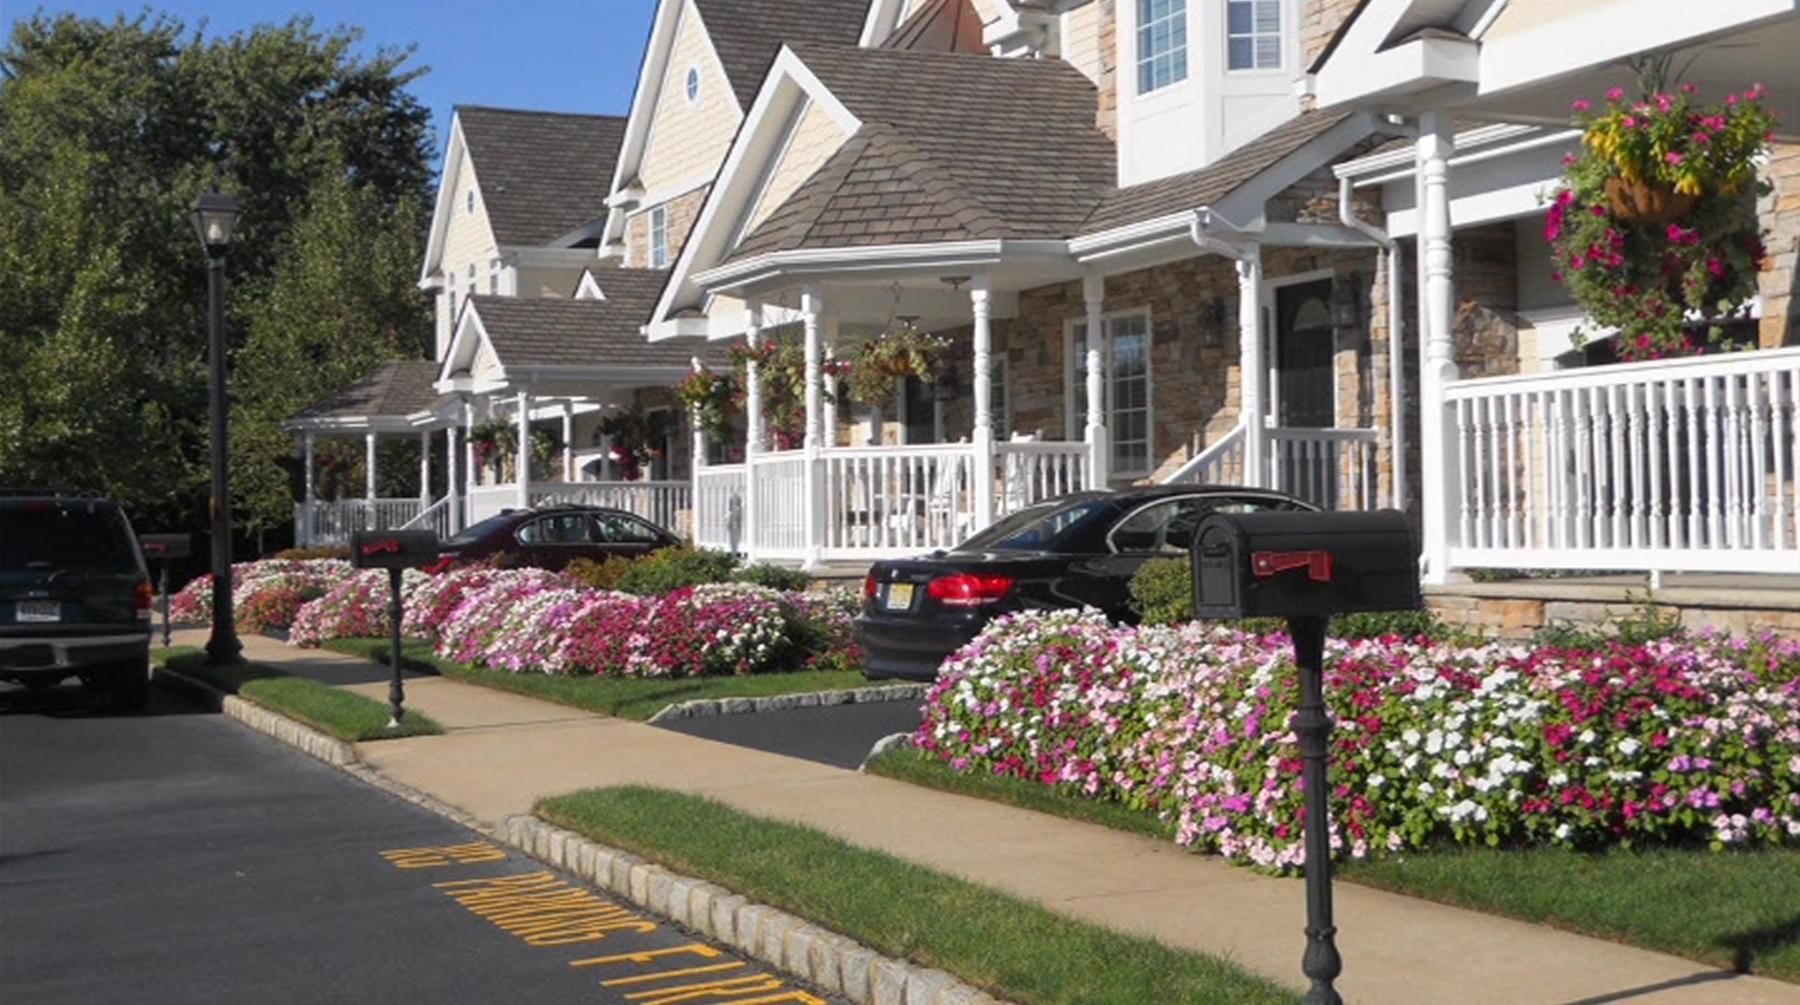 Riverview Villas-Long Branch NJ.jpg